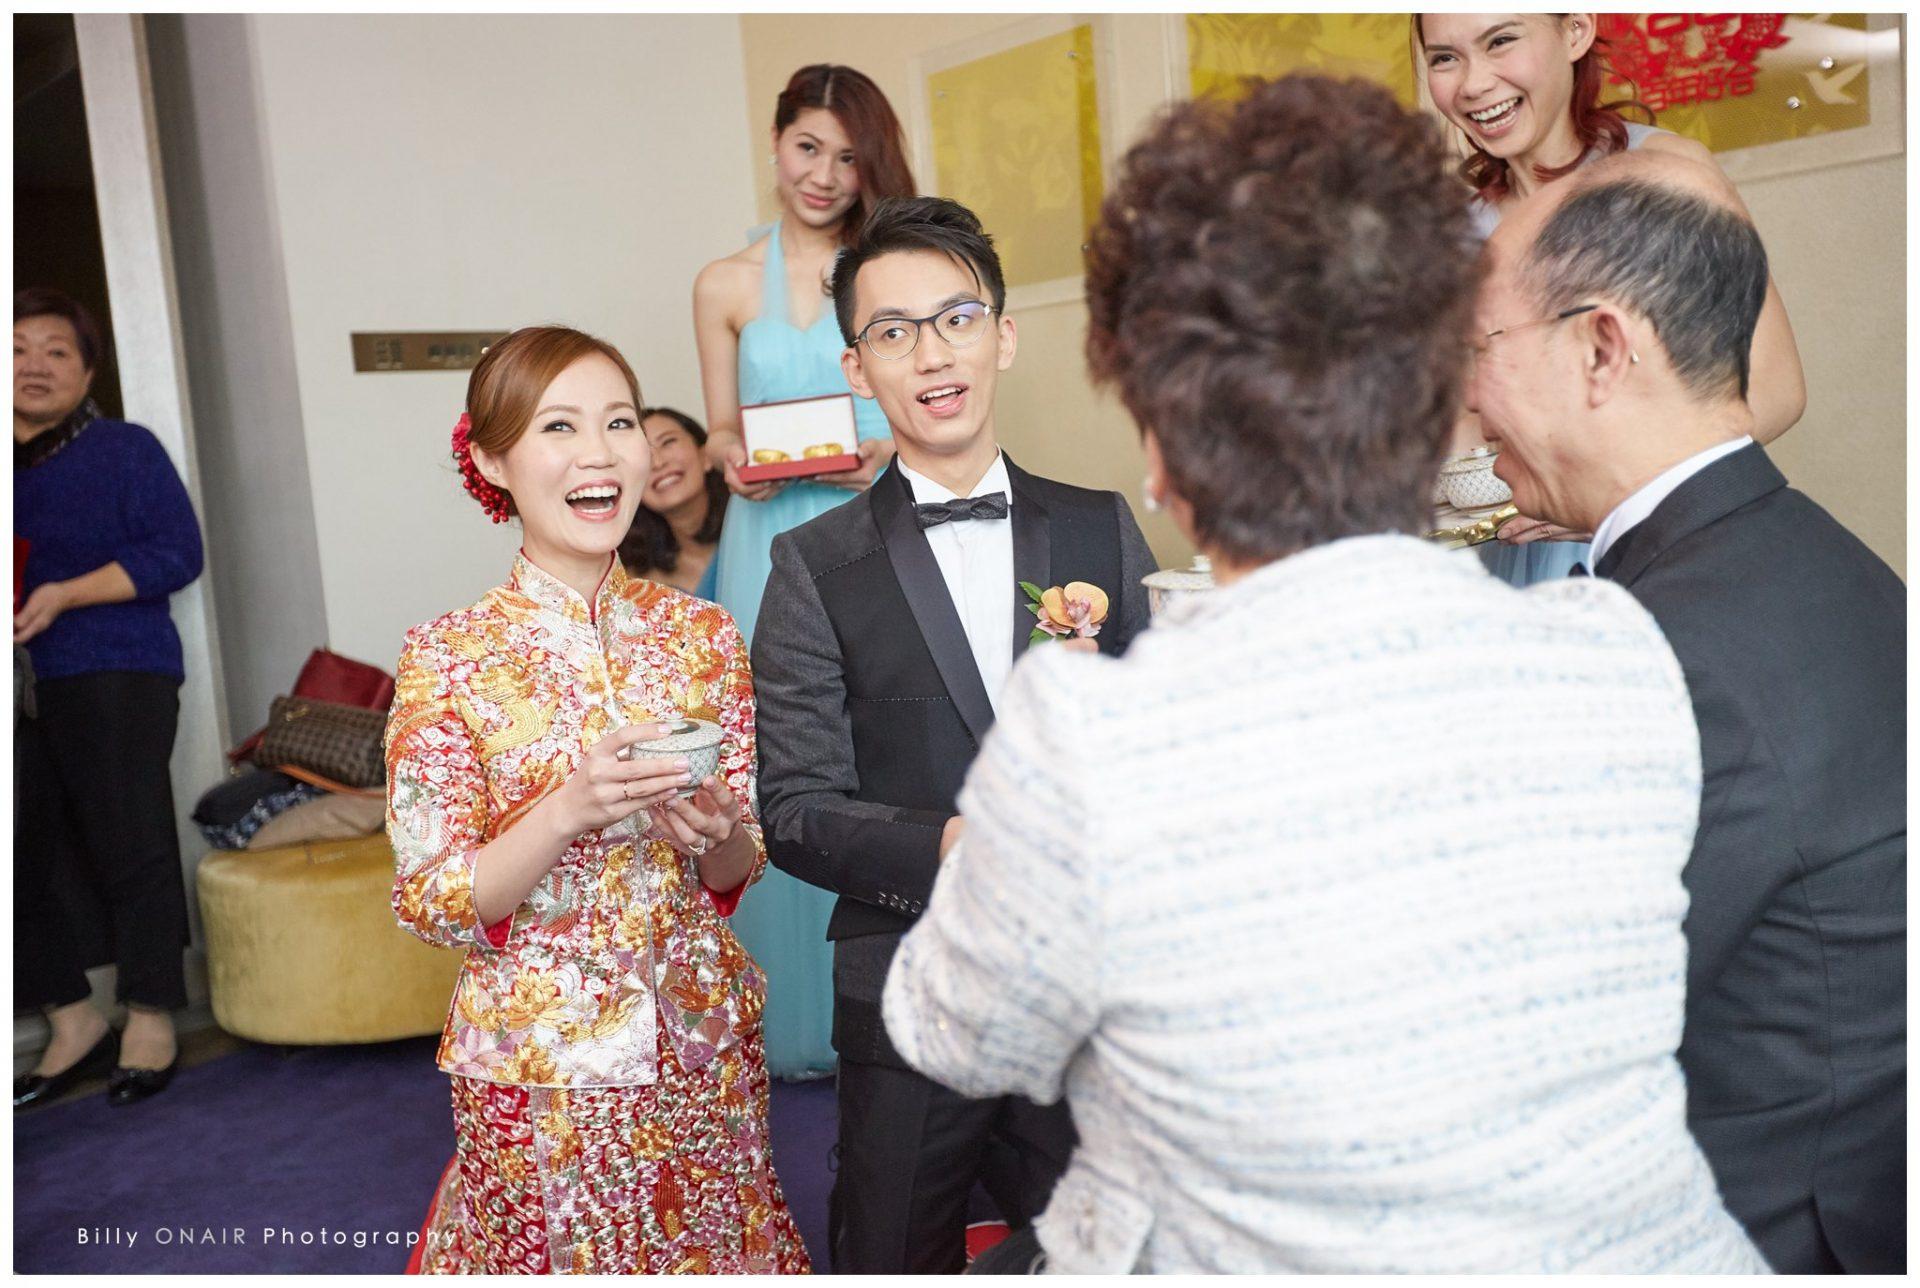 billy_wedding_photography_011